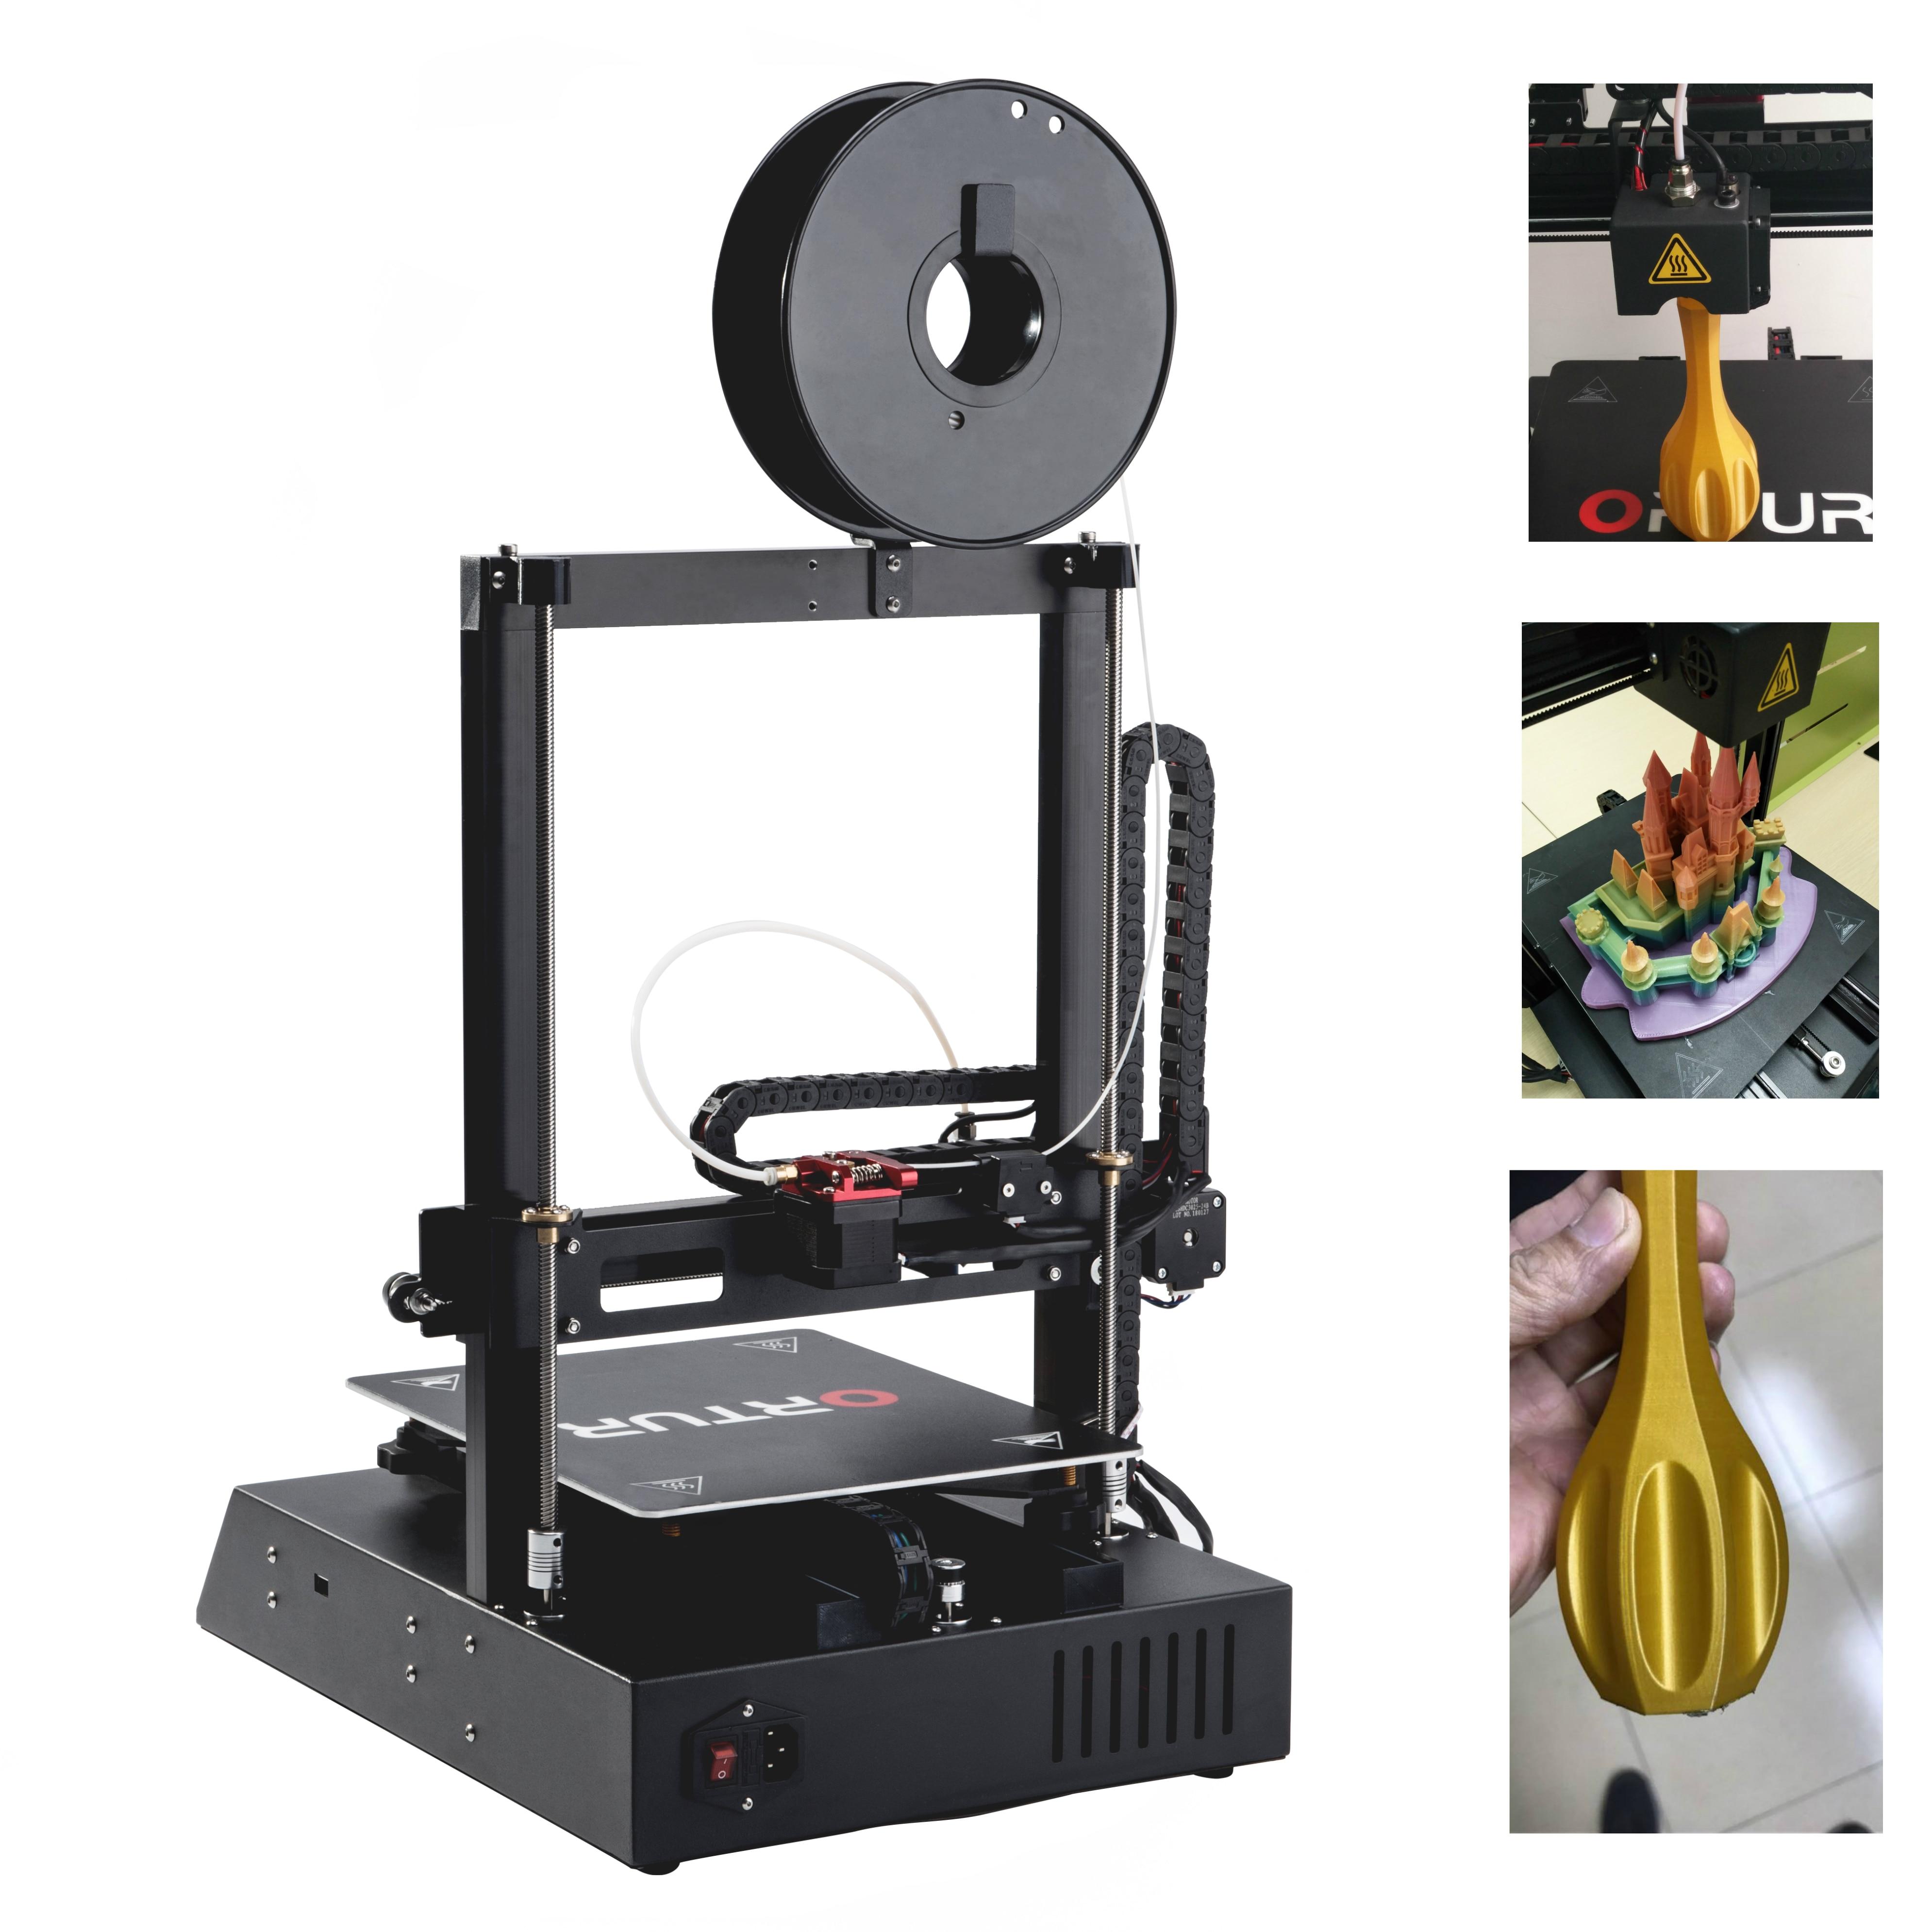 Free shipping Ortur4 3d Printer Full Metal Frame High Precision 3d Printer Kkit Imprimante Impresora Filament Runout Sensor 2